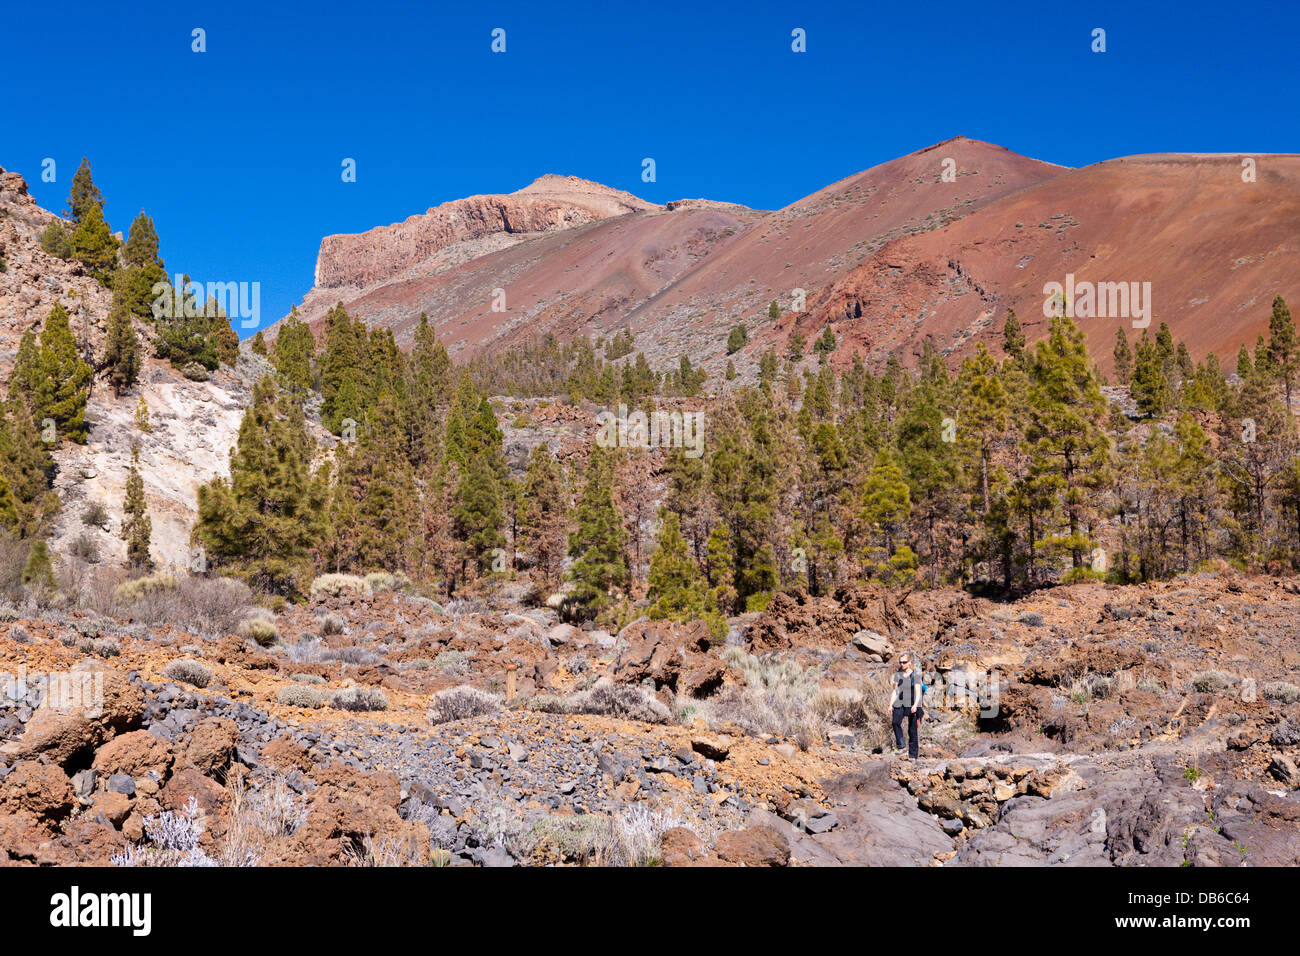 Hiking Tour to Paisaje Lunar near Vilaflor, Tenerife, Canary Islands, Spain - Stock Image